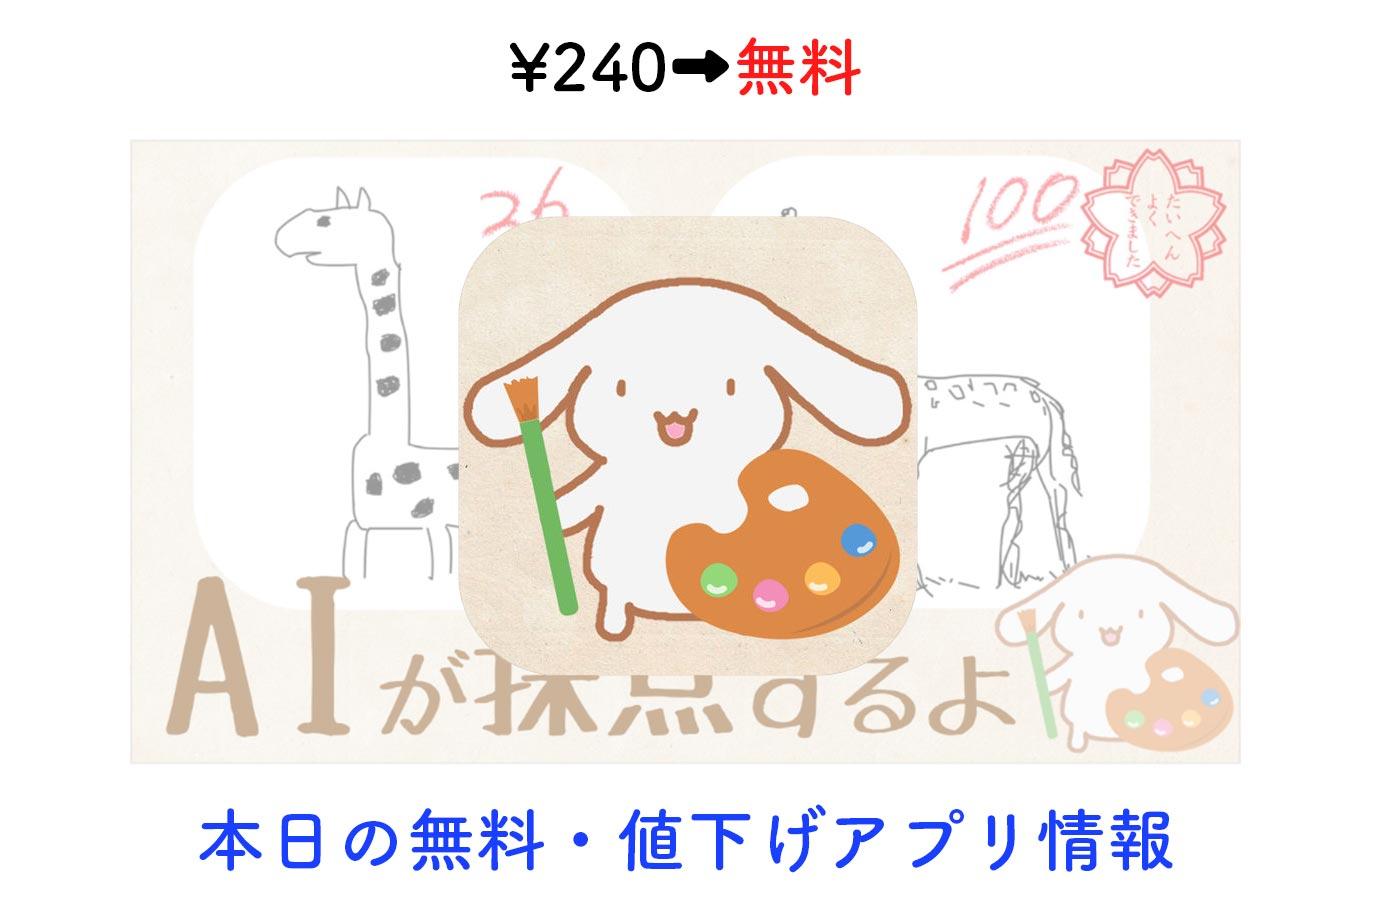 Appsale0127